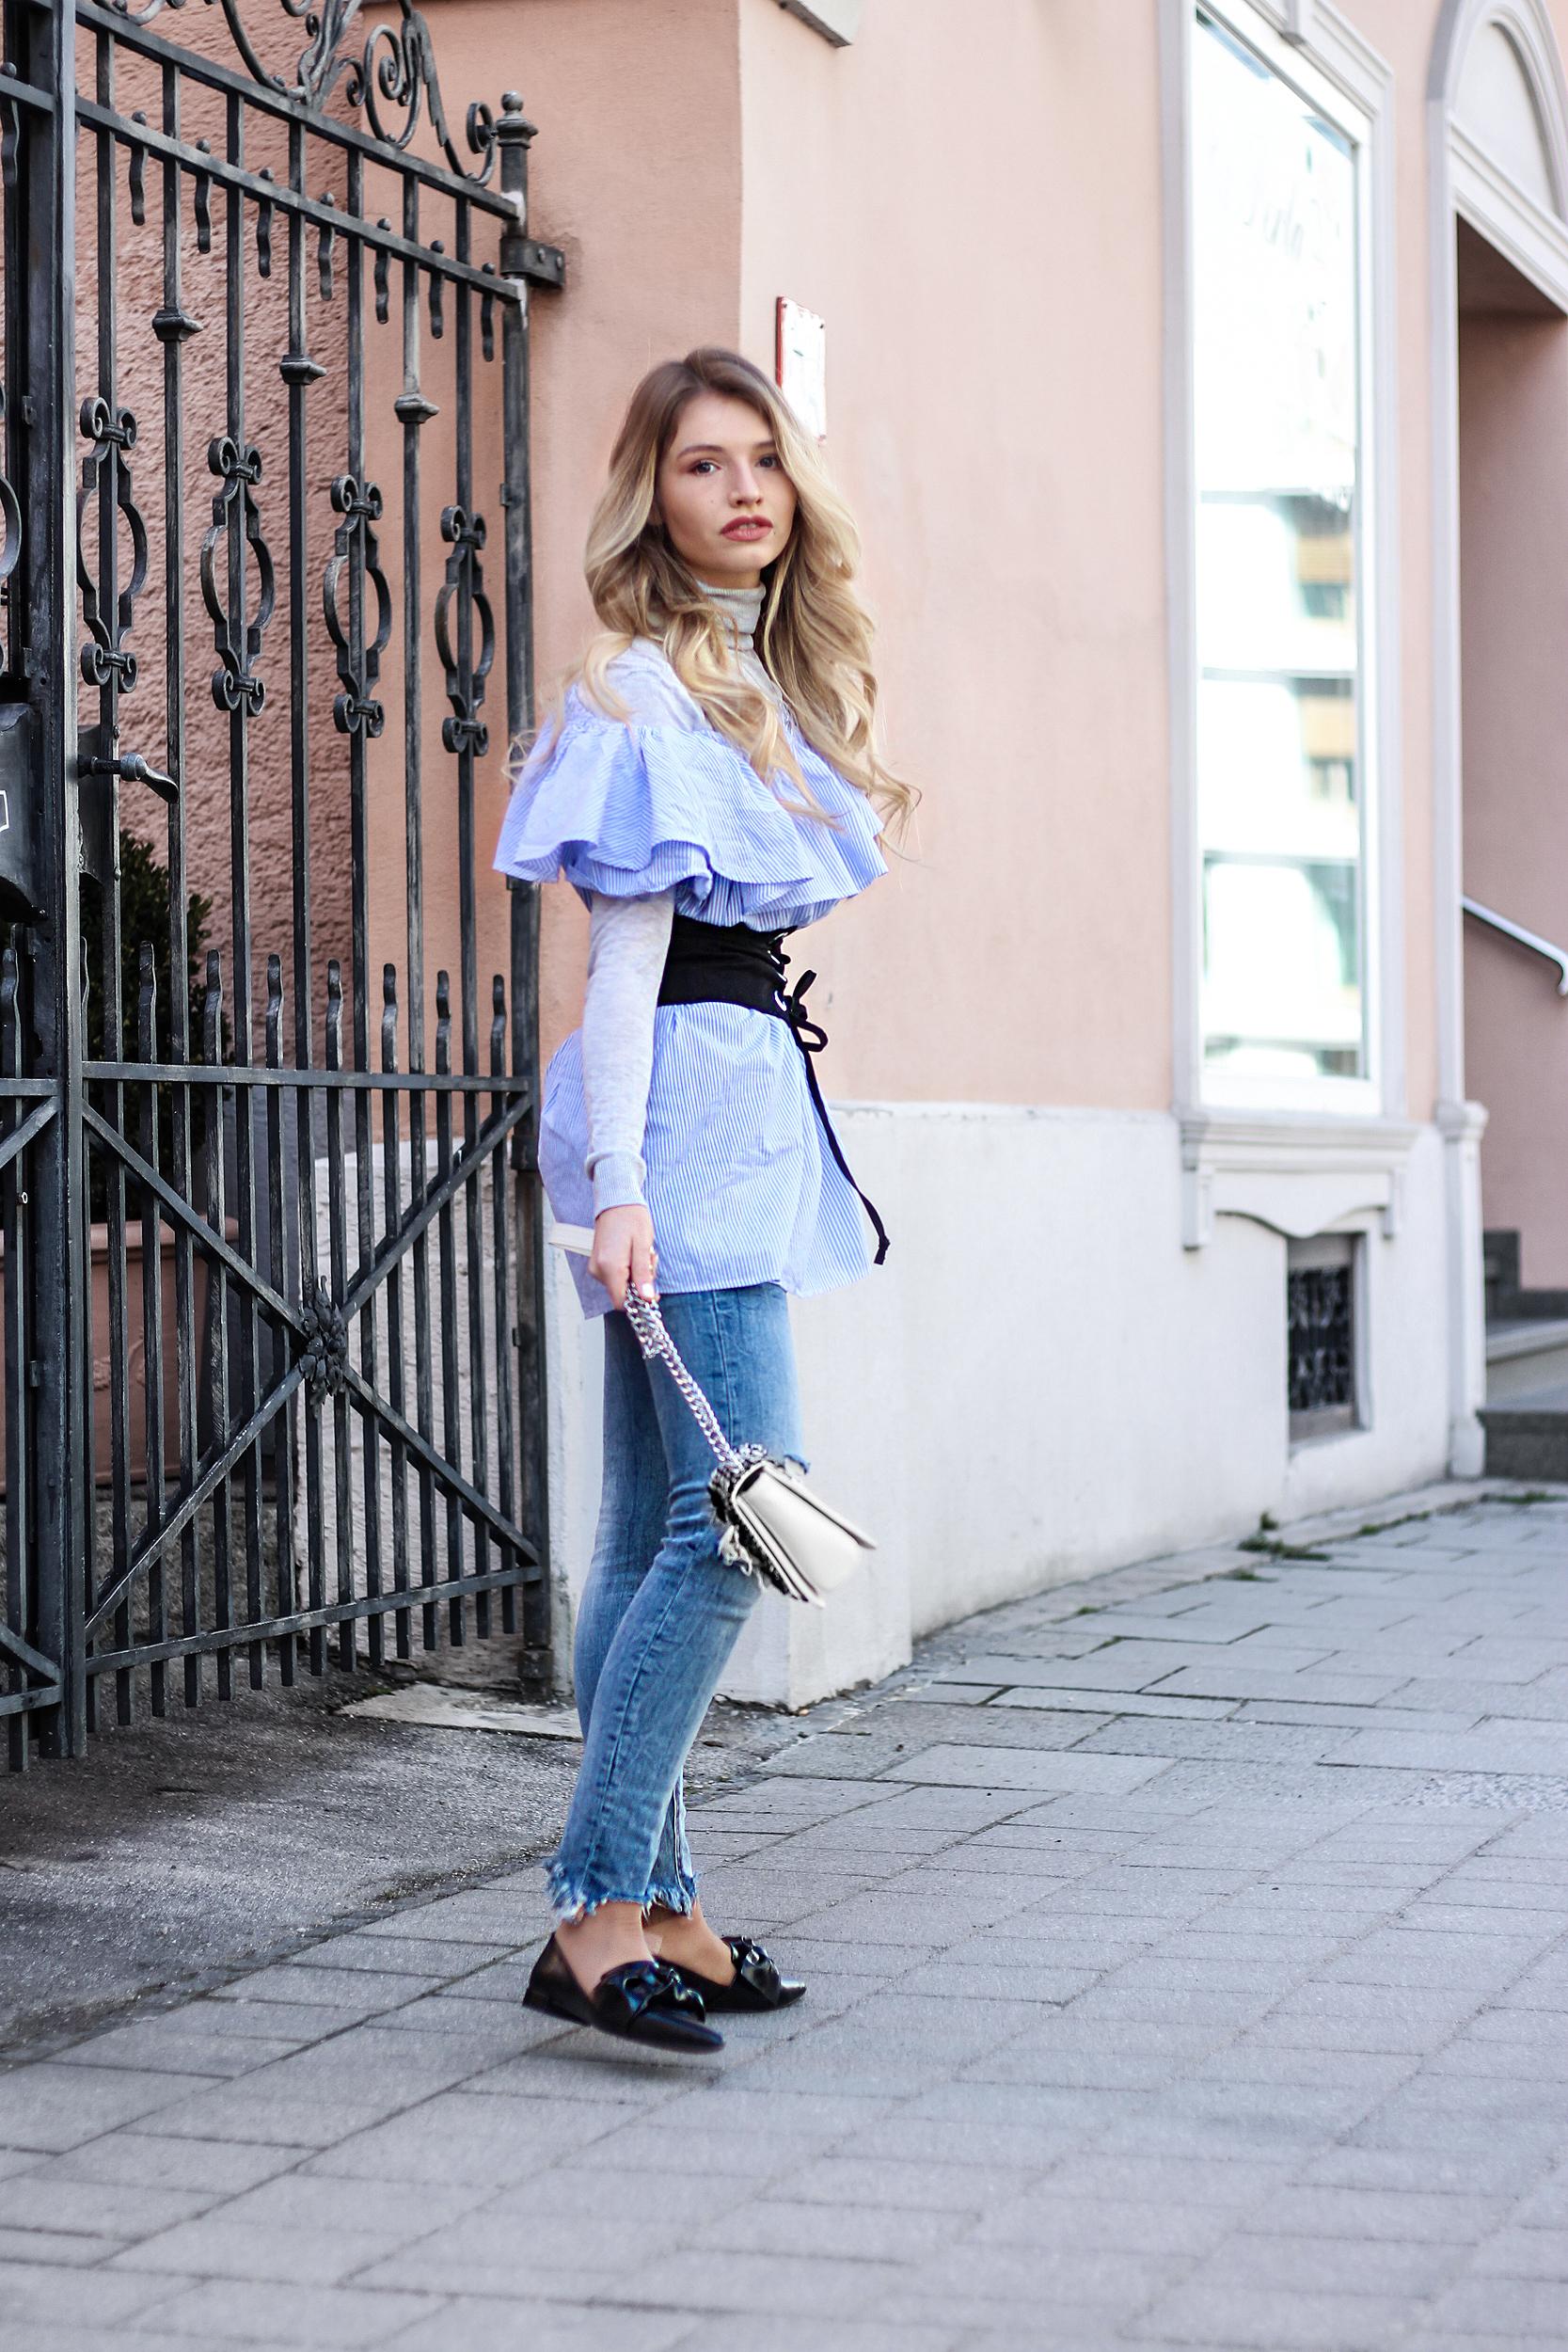 Zara kleider sommer 2017